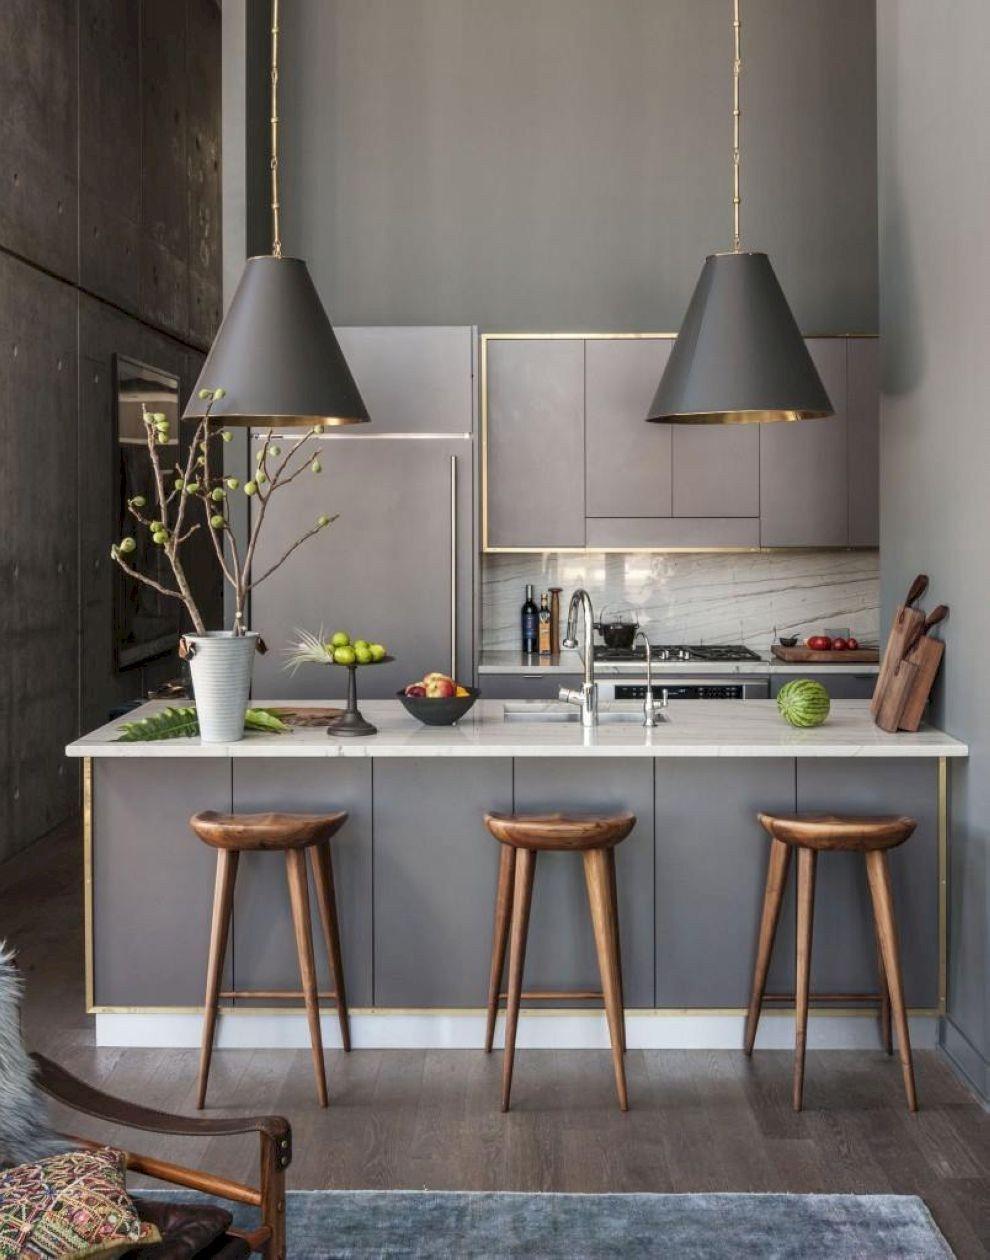 Extraordinary small kitchen design ideas 27 | Help me decorate my ...